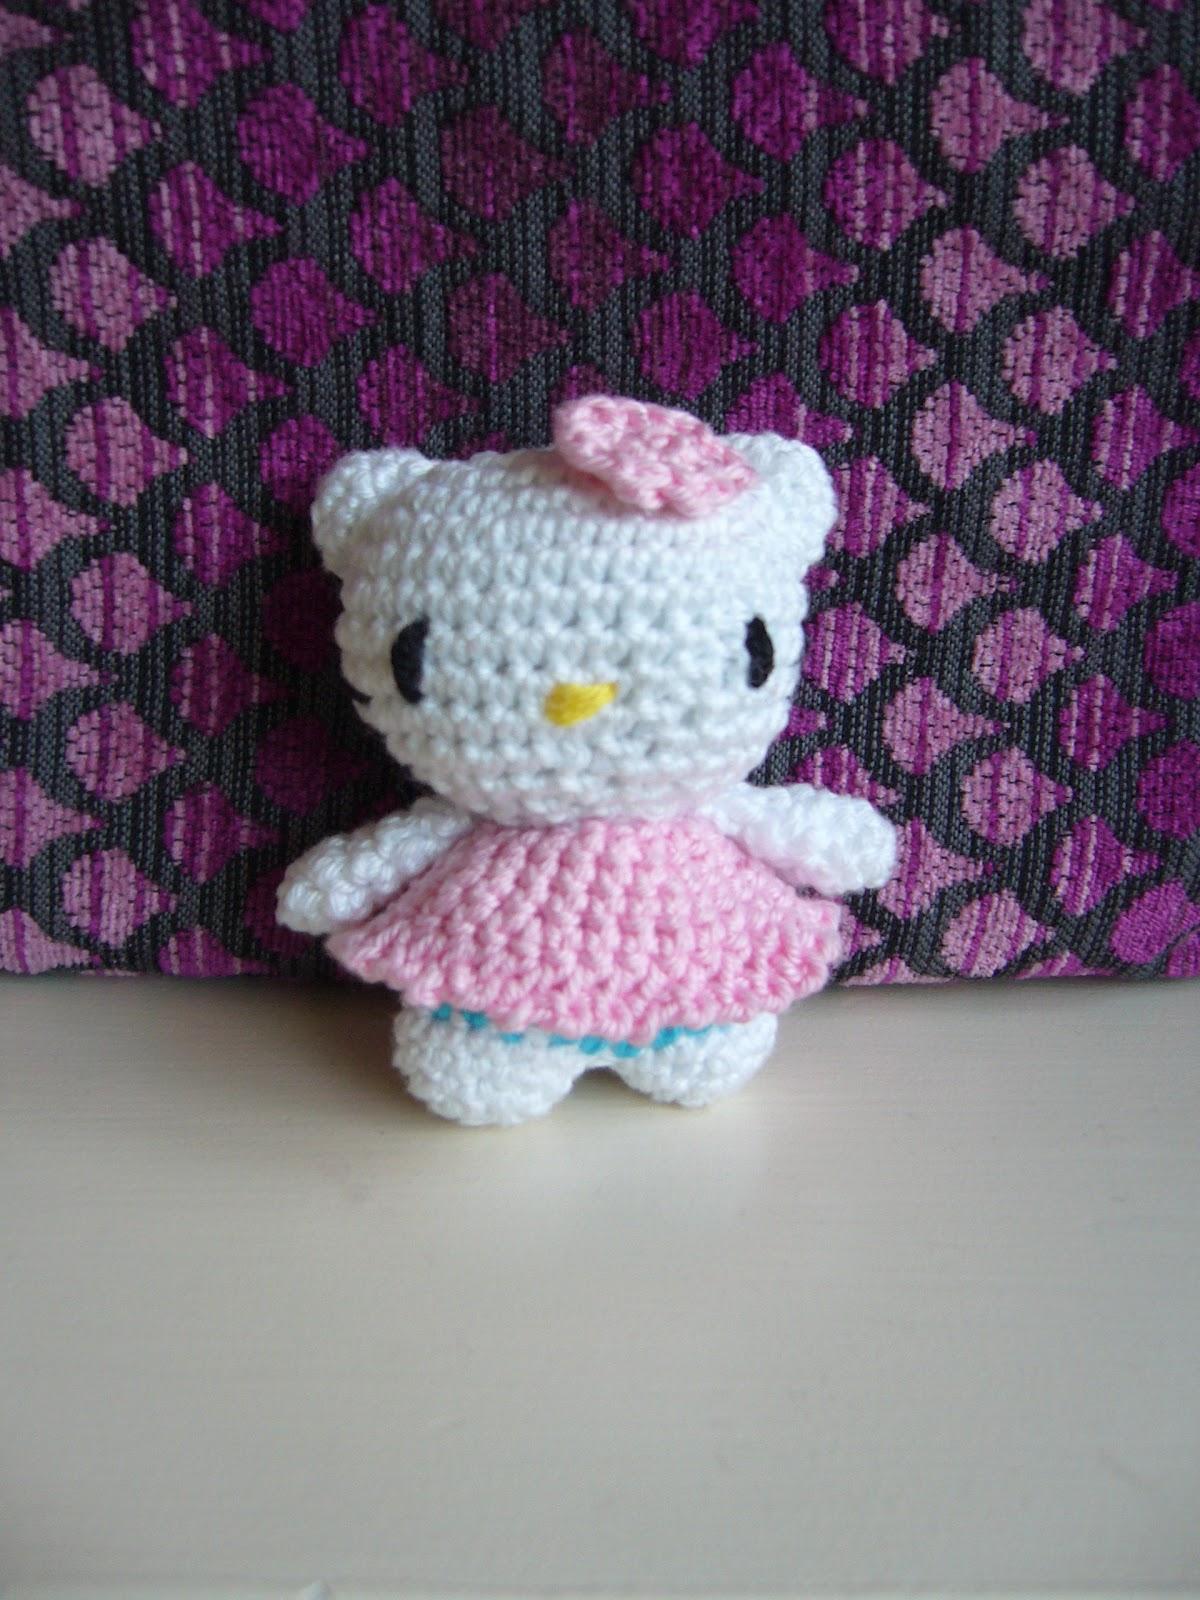 Kitty tejida | Hello kitty amigurumis, Muñeca amigurumi, Ganchillo ... | 1600x1200